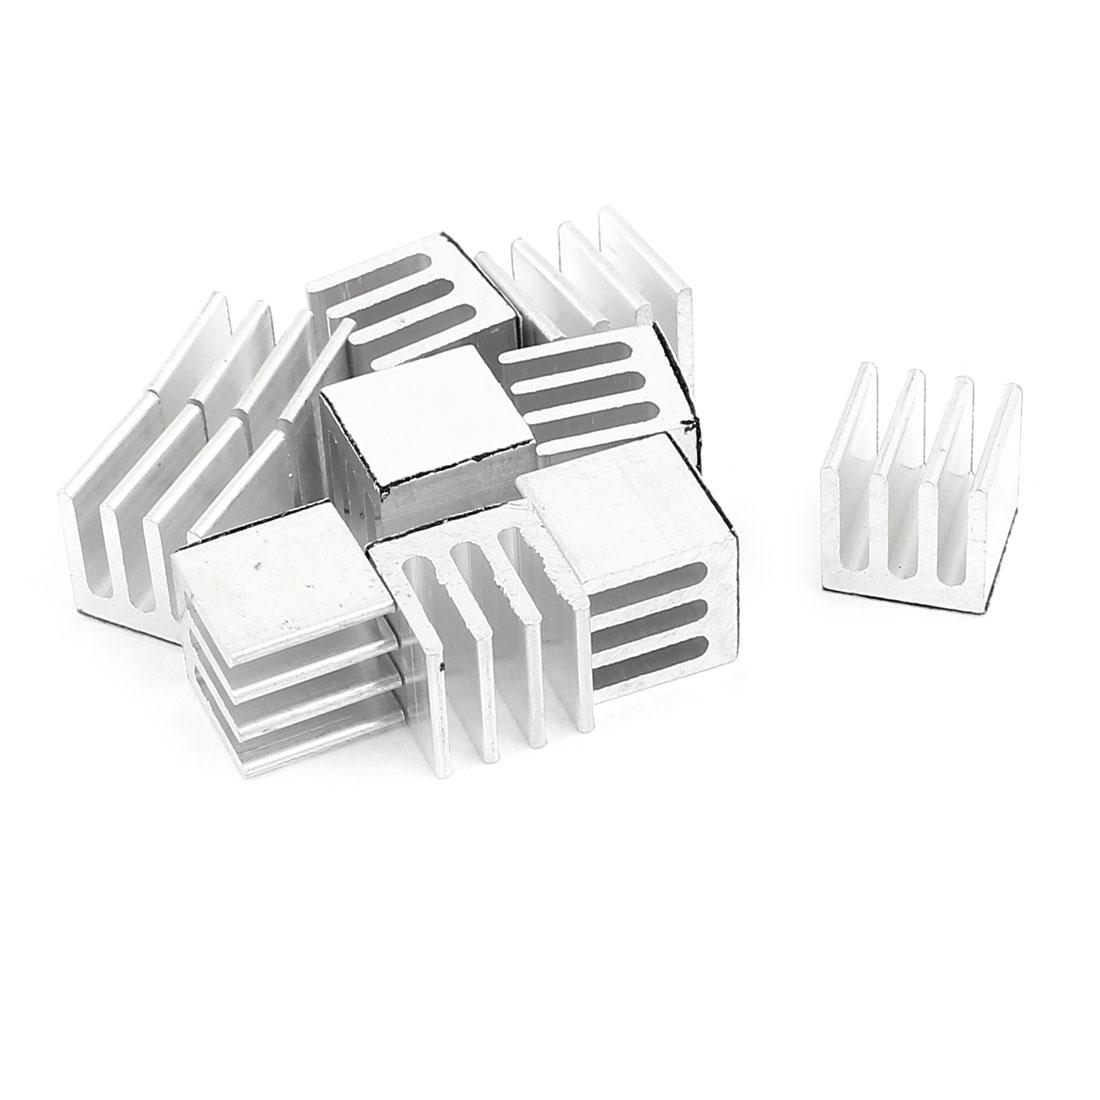 10 Pcs Foursquare Aluminum 9 x 9 x 9mm Heatsink Radiator Fin Silver Tone for IC